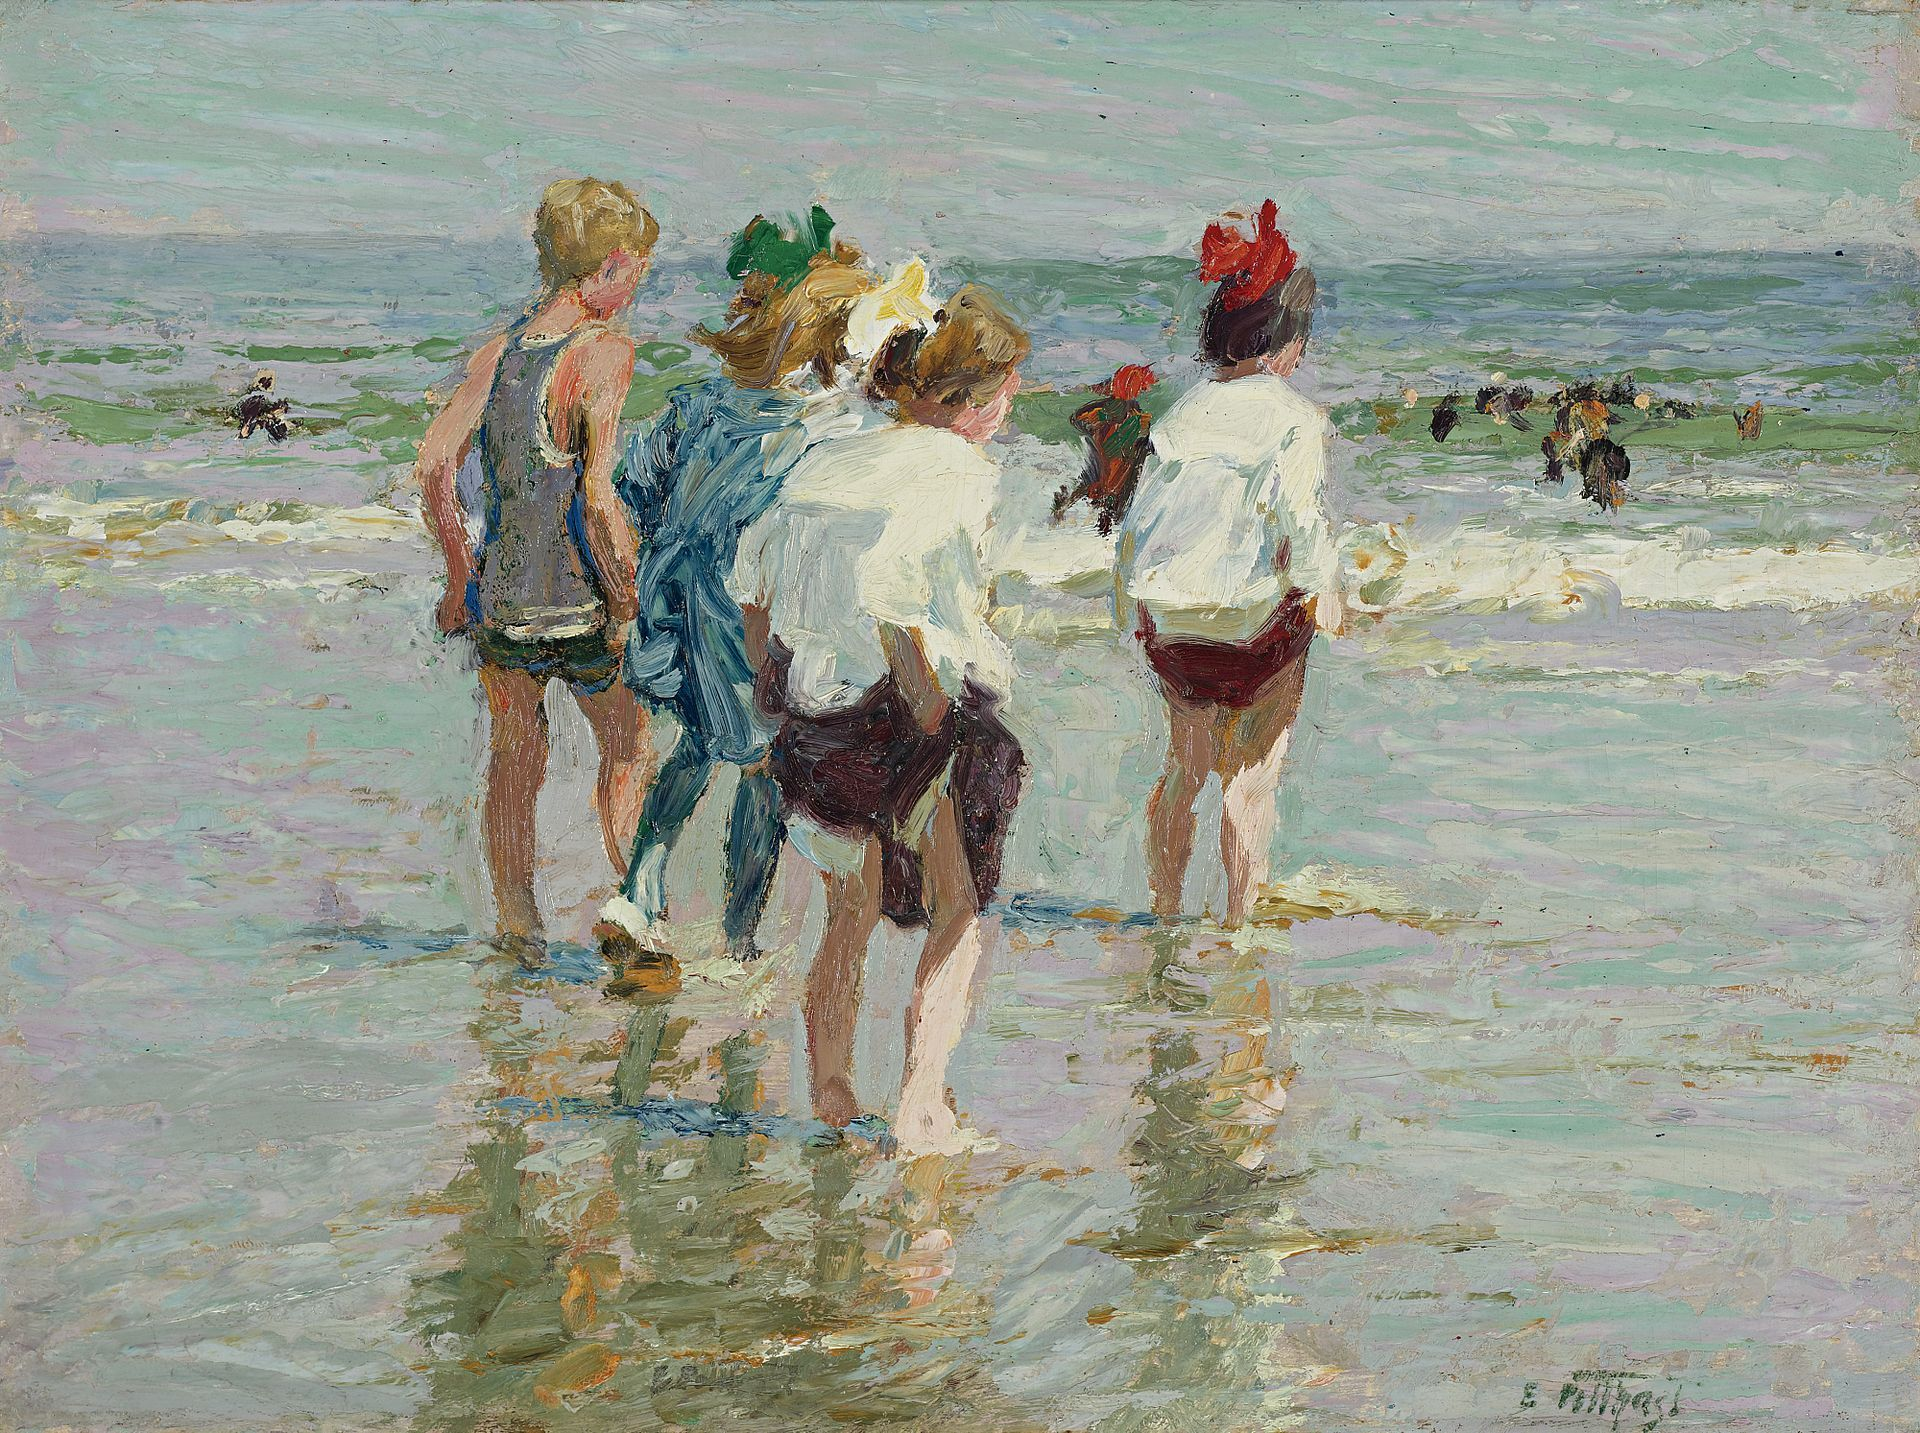 Edward Henry Potthast - Summer day, Brighton Beach